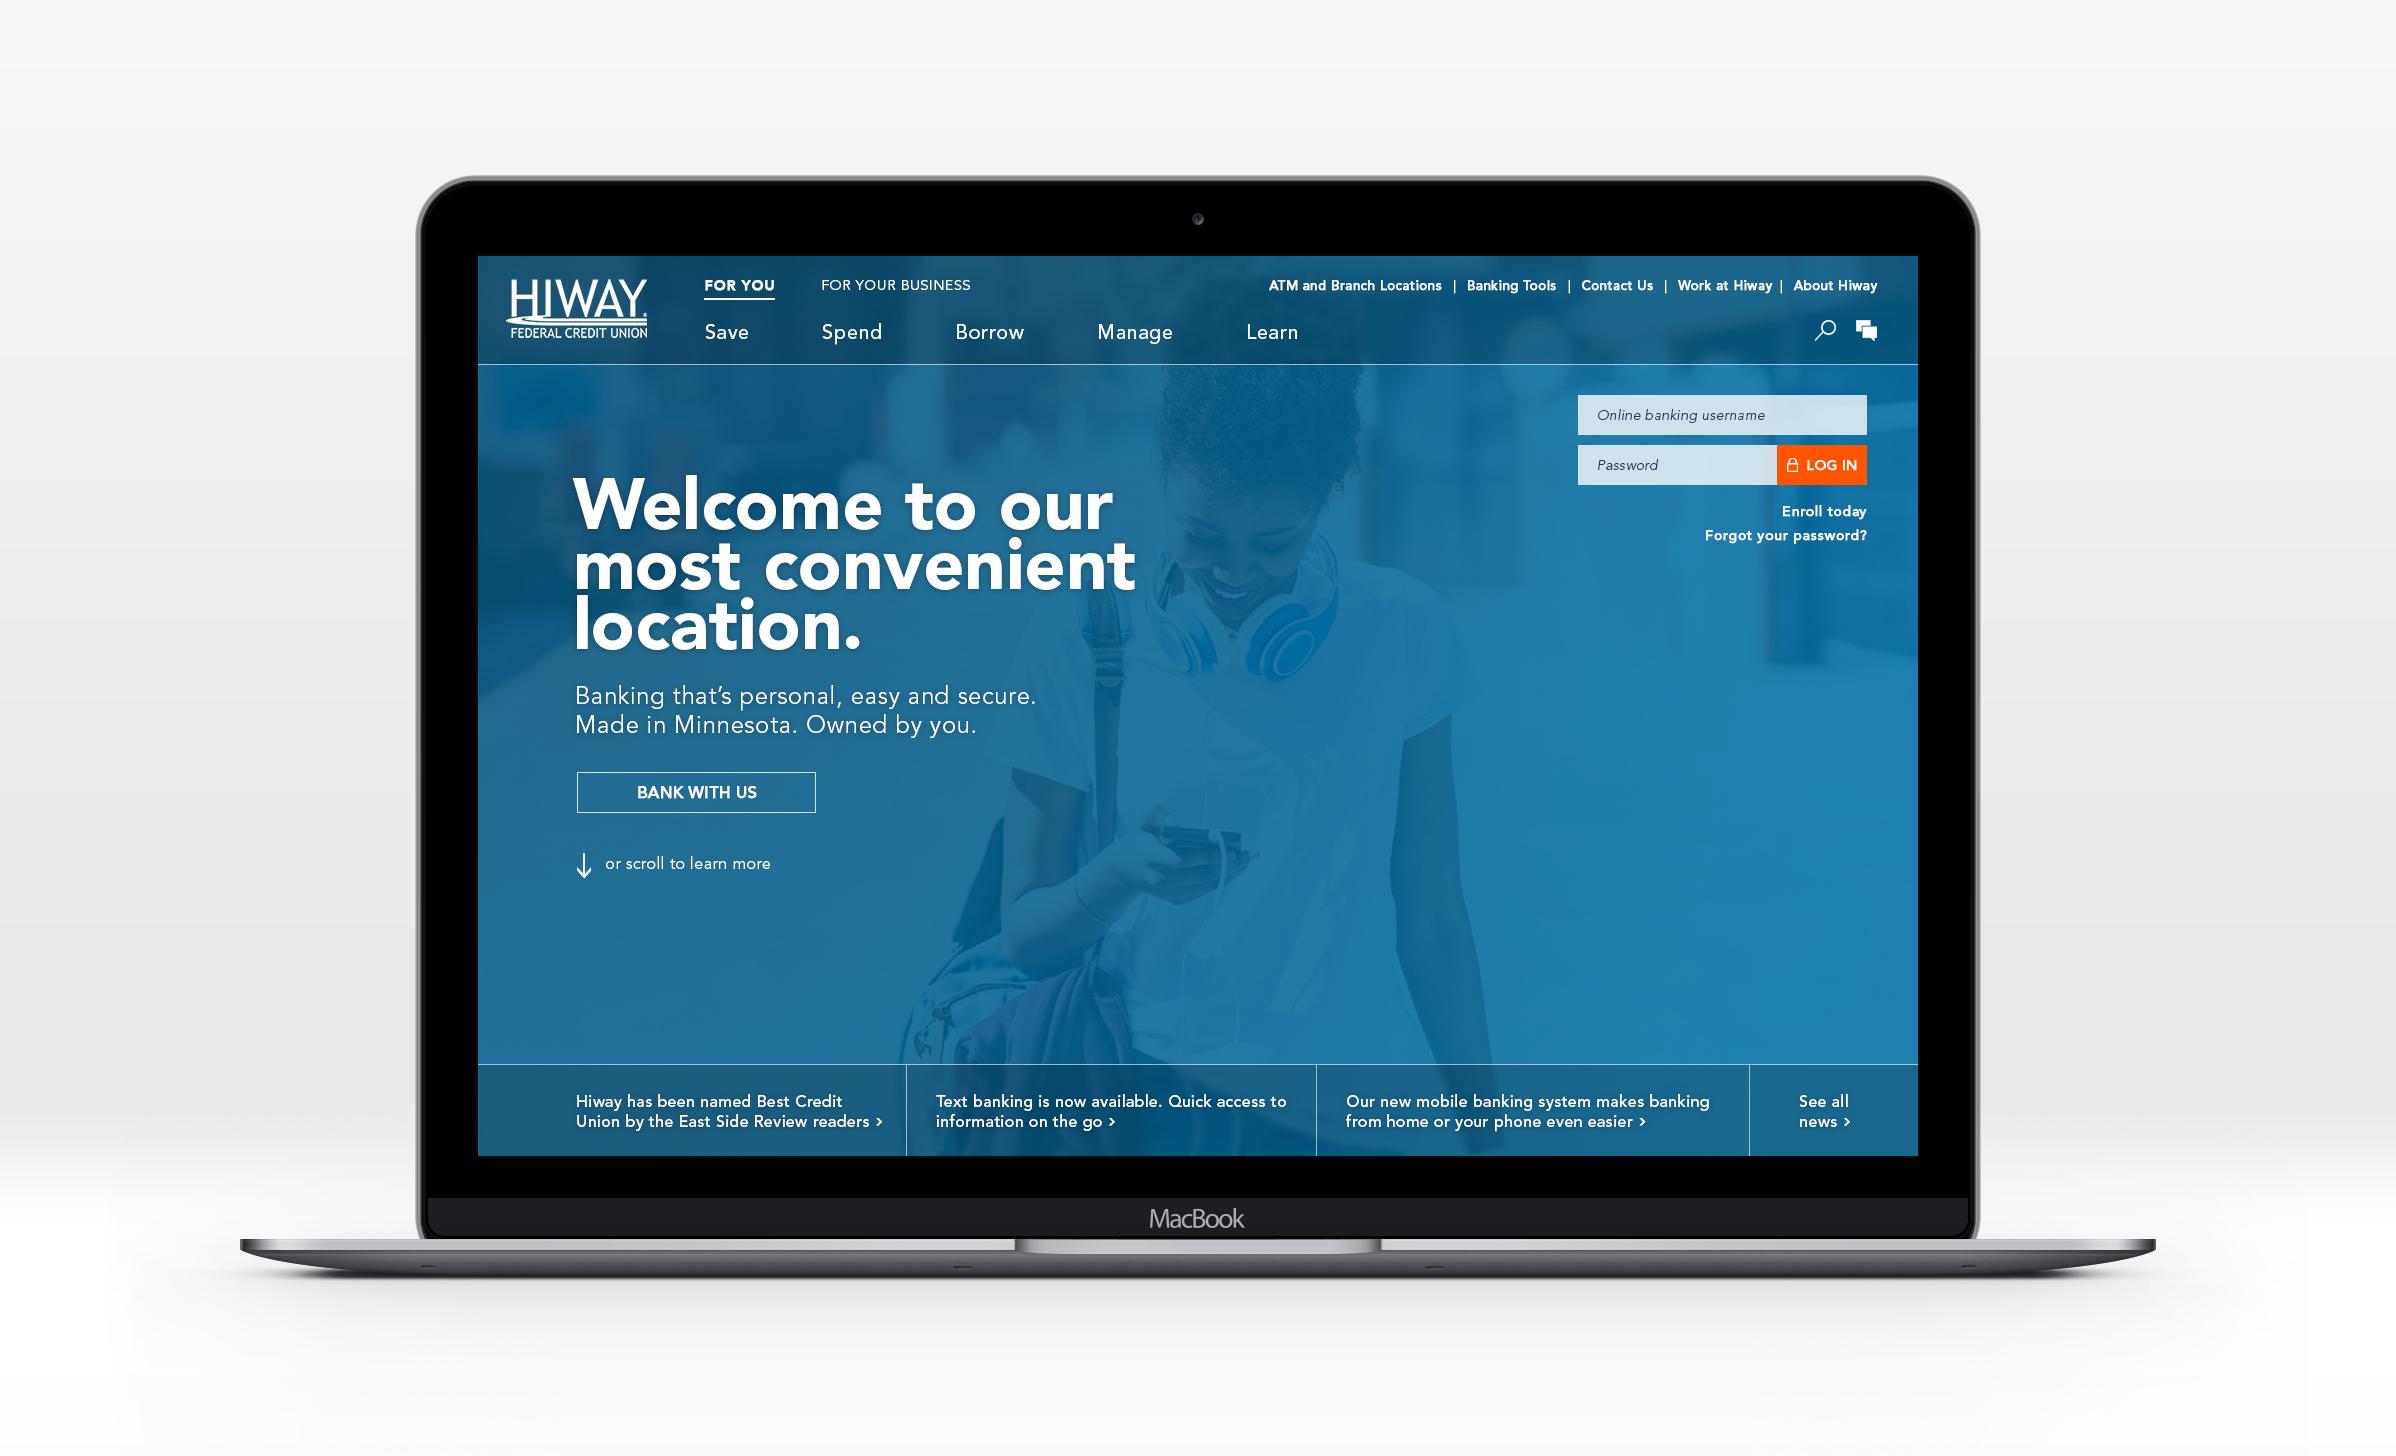 Hiway-Federal-Credit-Union-Website-Redesign-Macbookjpg